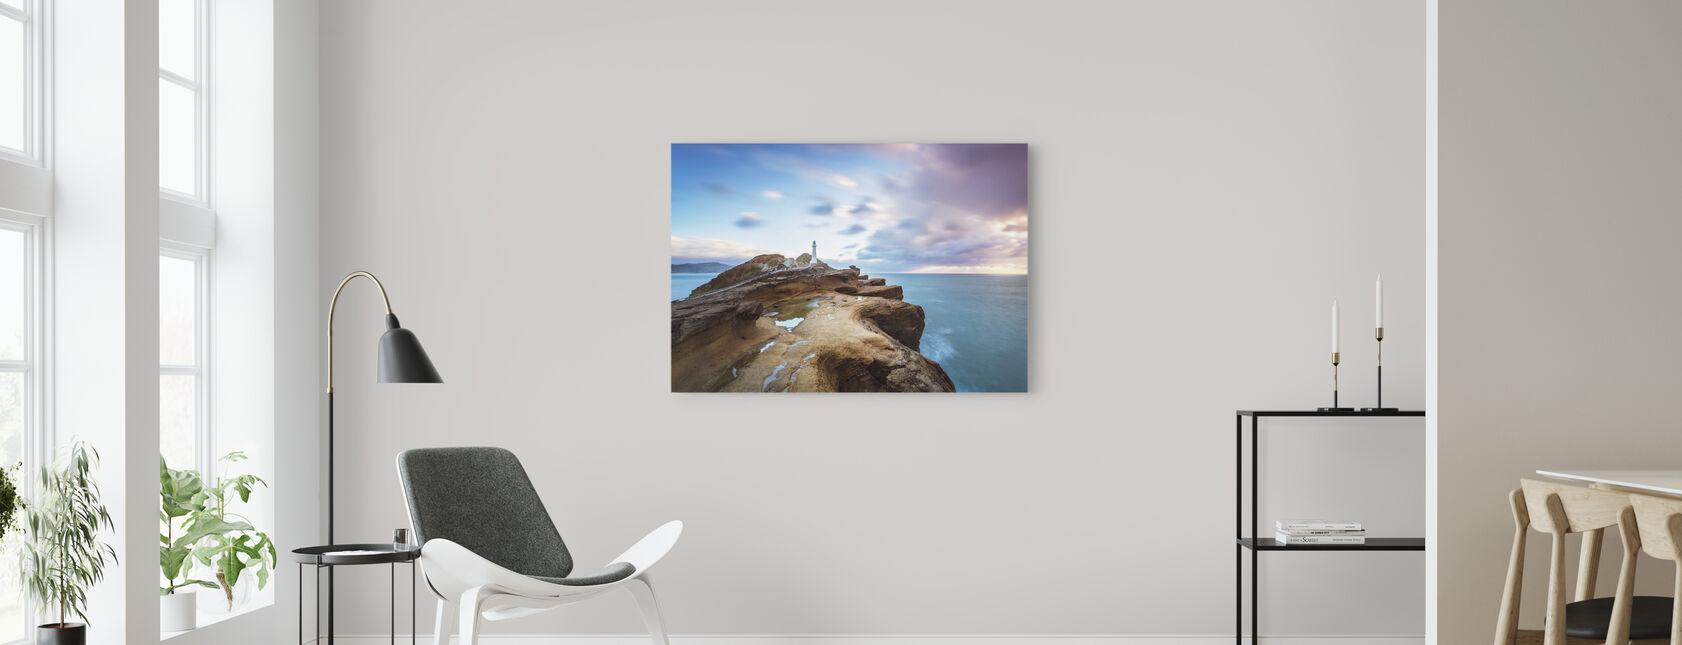 Lighthouse at Sunrise - Canvas print - Living Room